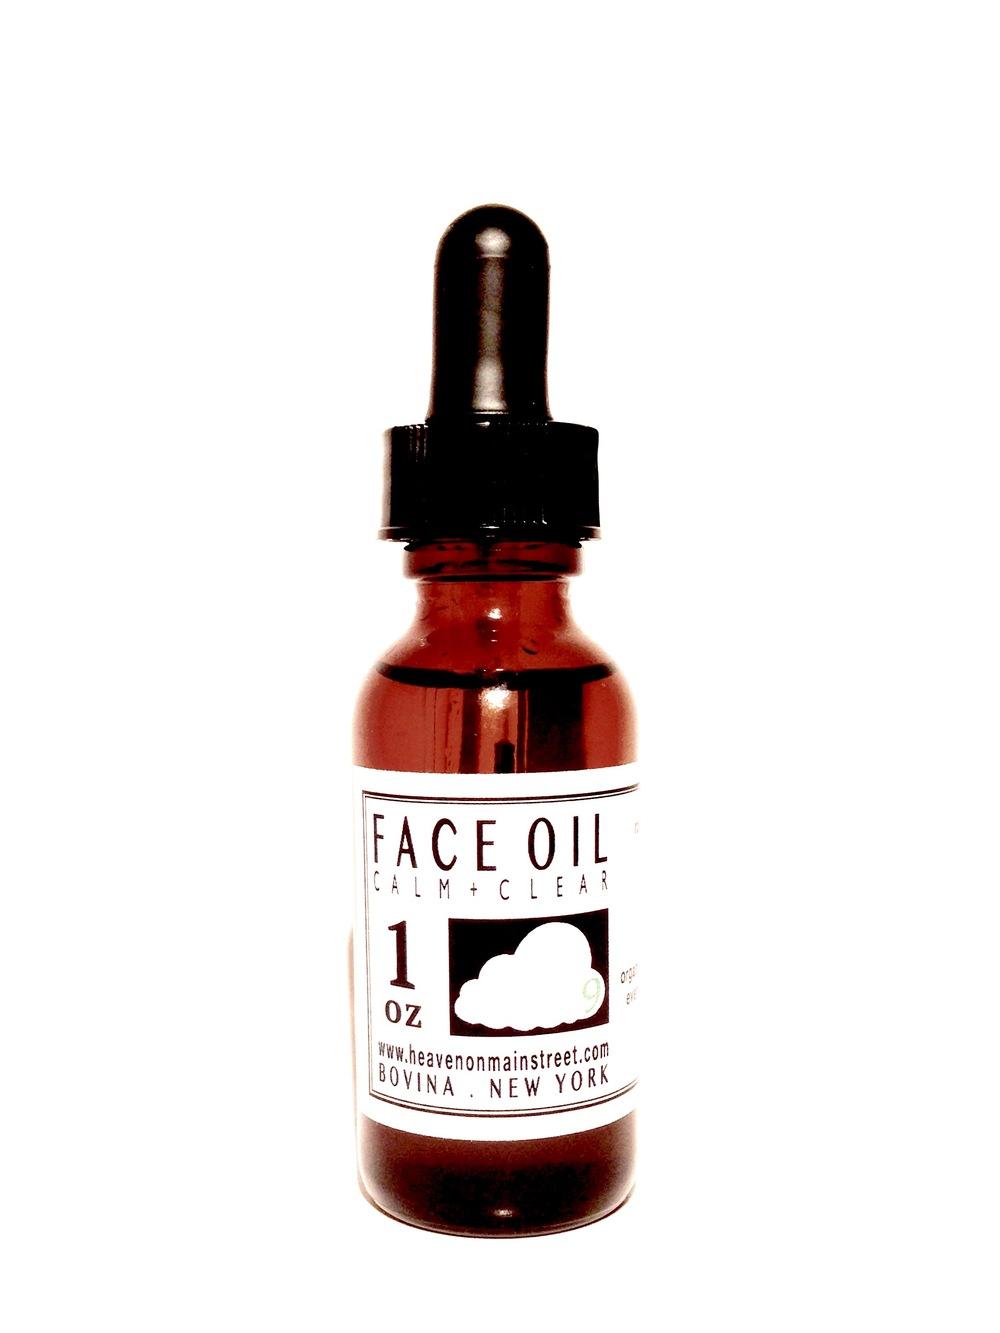 Heaven on Main Street Face Oil - Calm & Clear $59